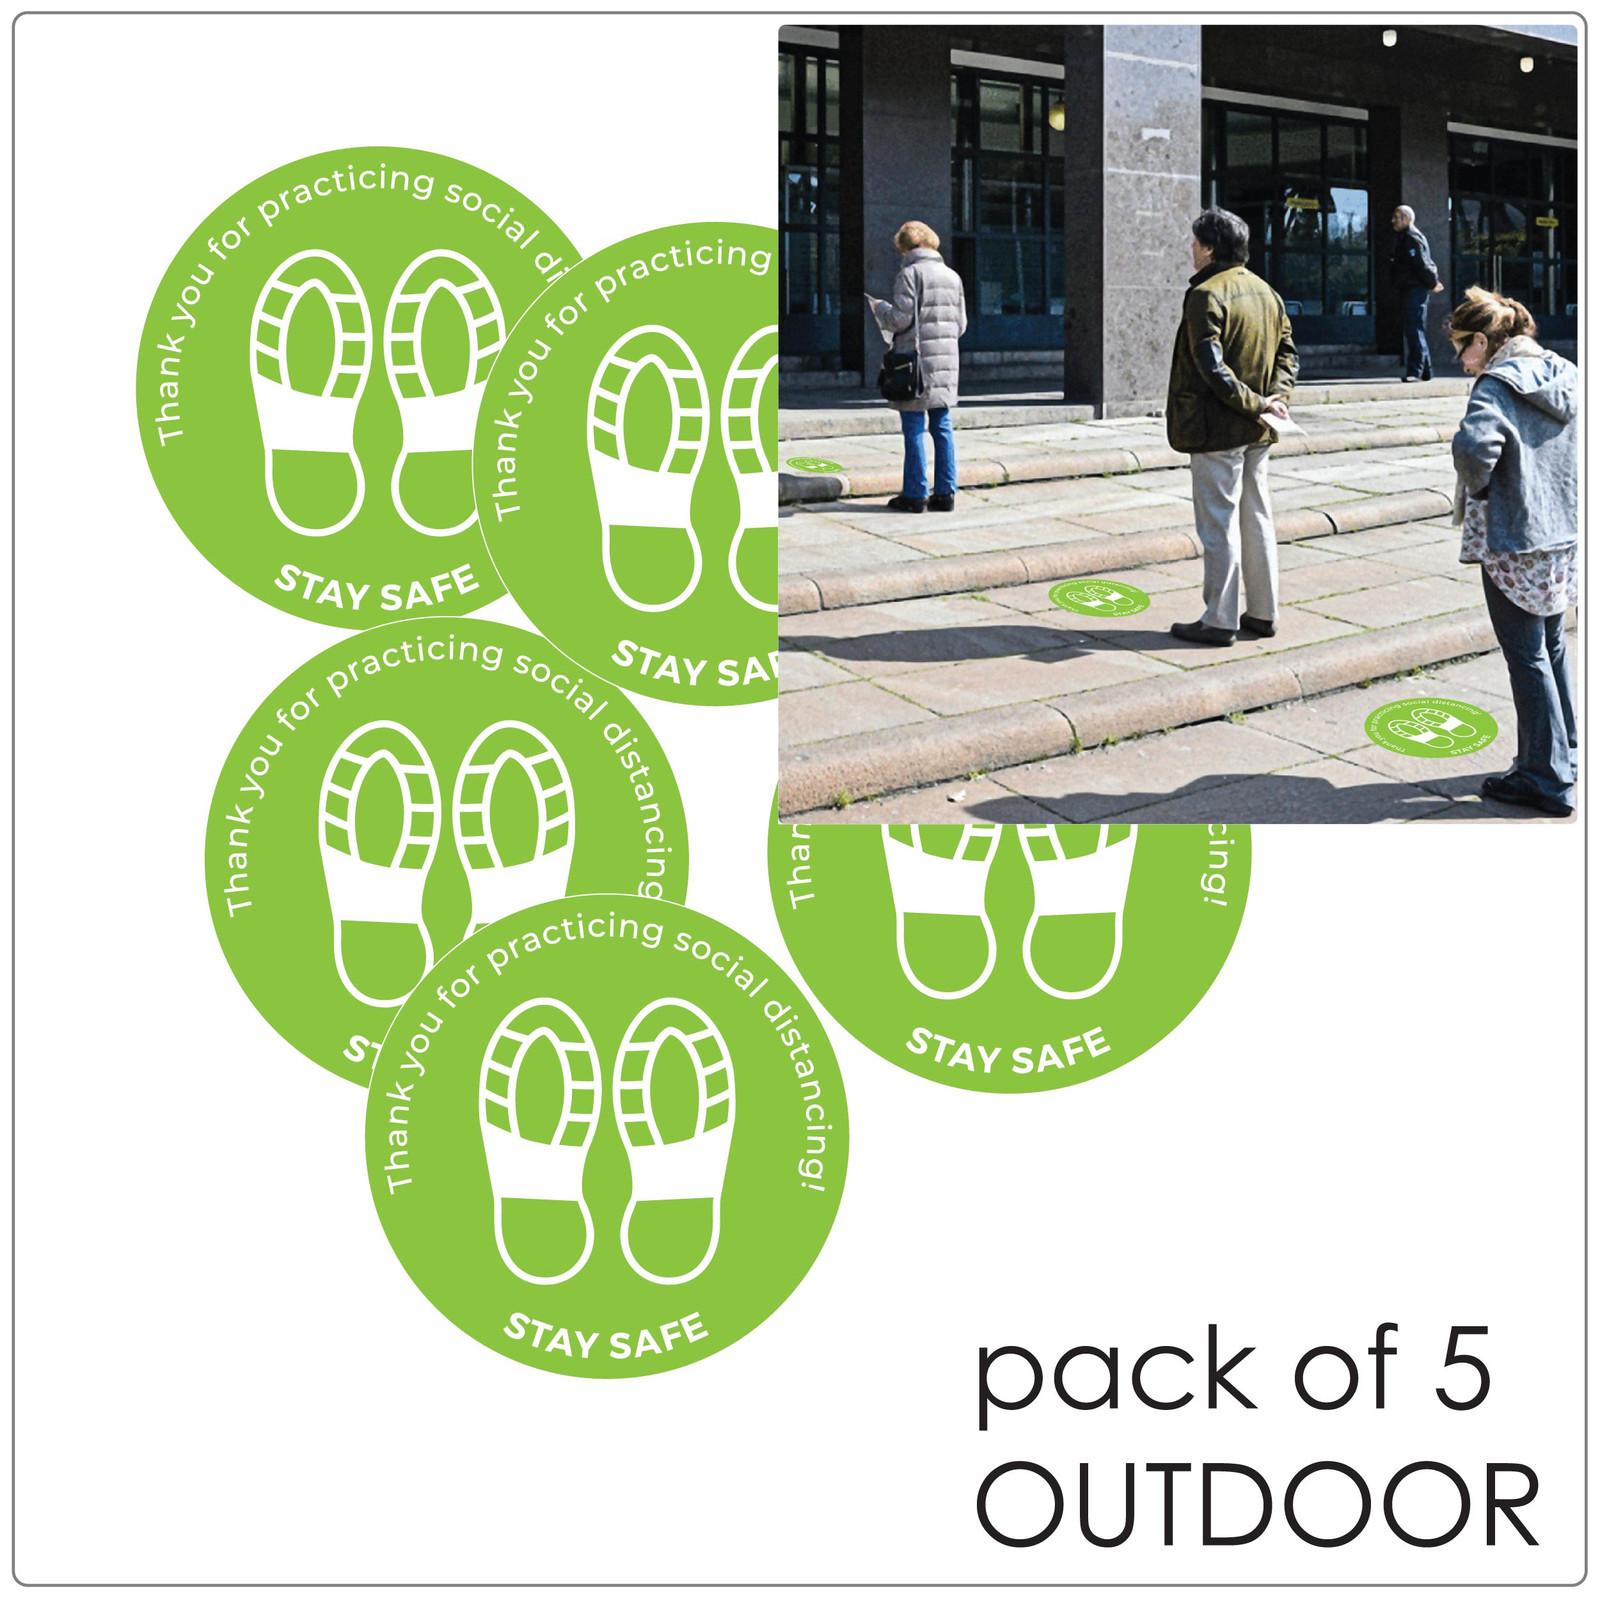 social distancing floor sticker for outdoor floors, pack of 5 Self-adhesive Corona virus floor sticker to help social distancing.